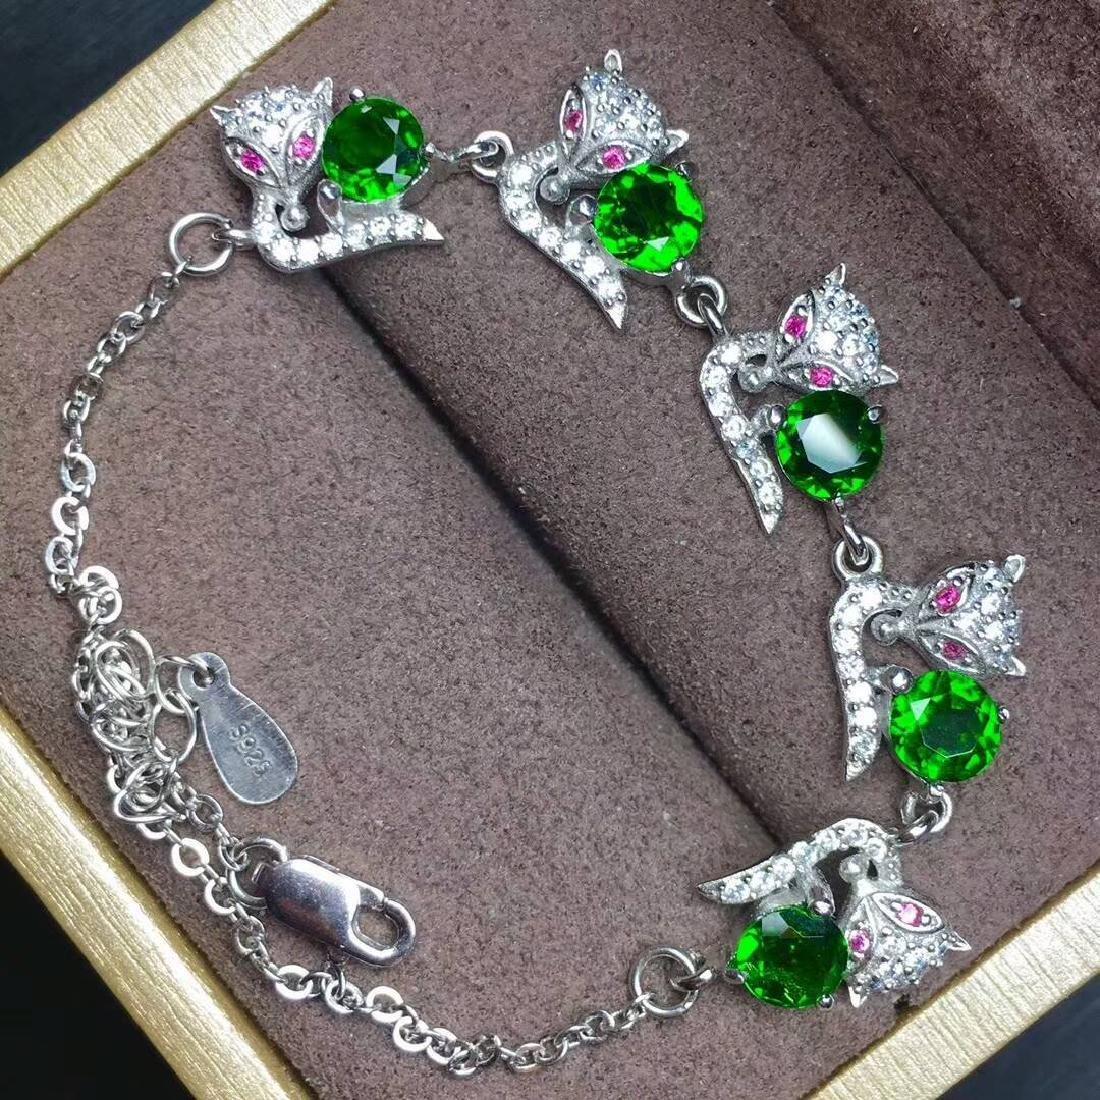 4ct Diopside Bracelets in 925 Silver - 3